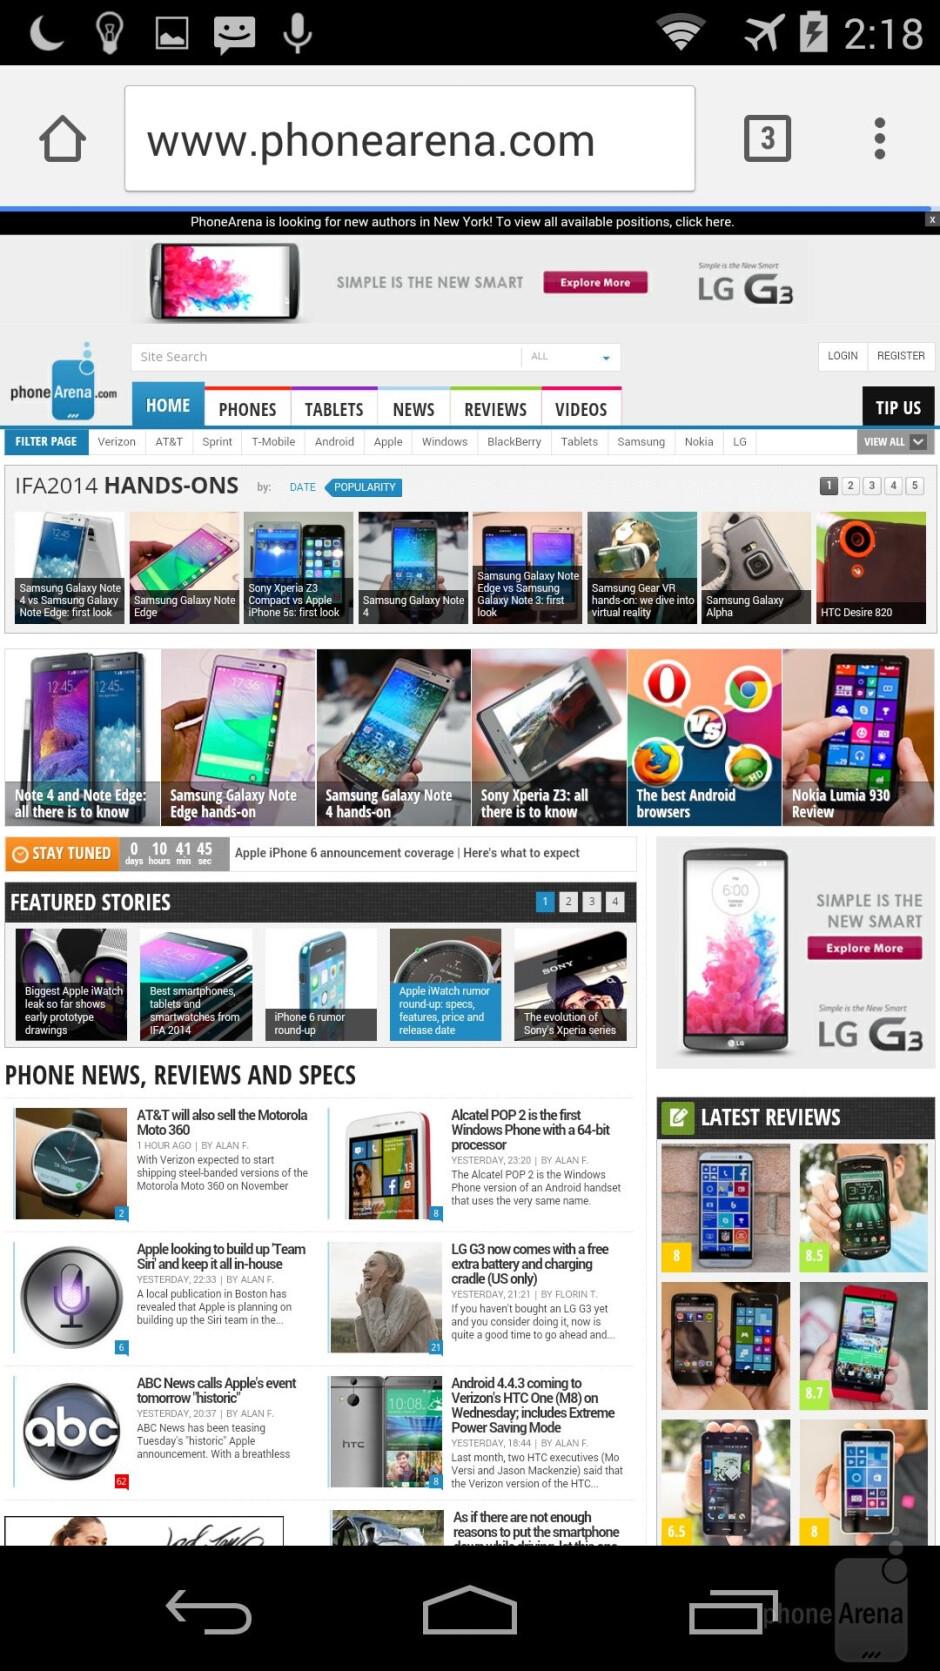 Motorola Moto X - Web browsers - Apple iPhone 6 vs Motorola Moto X 2014